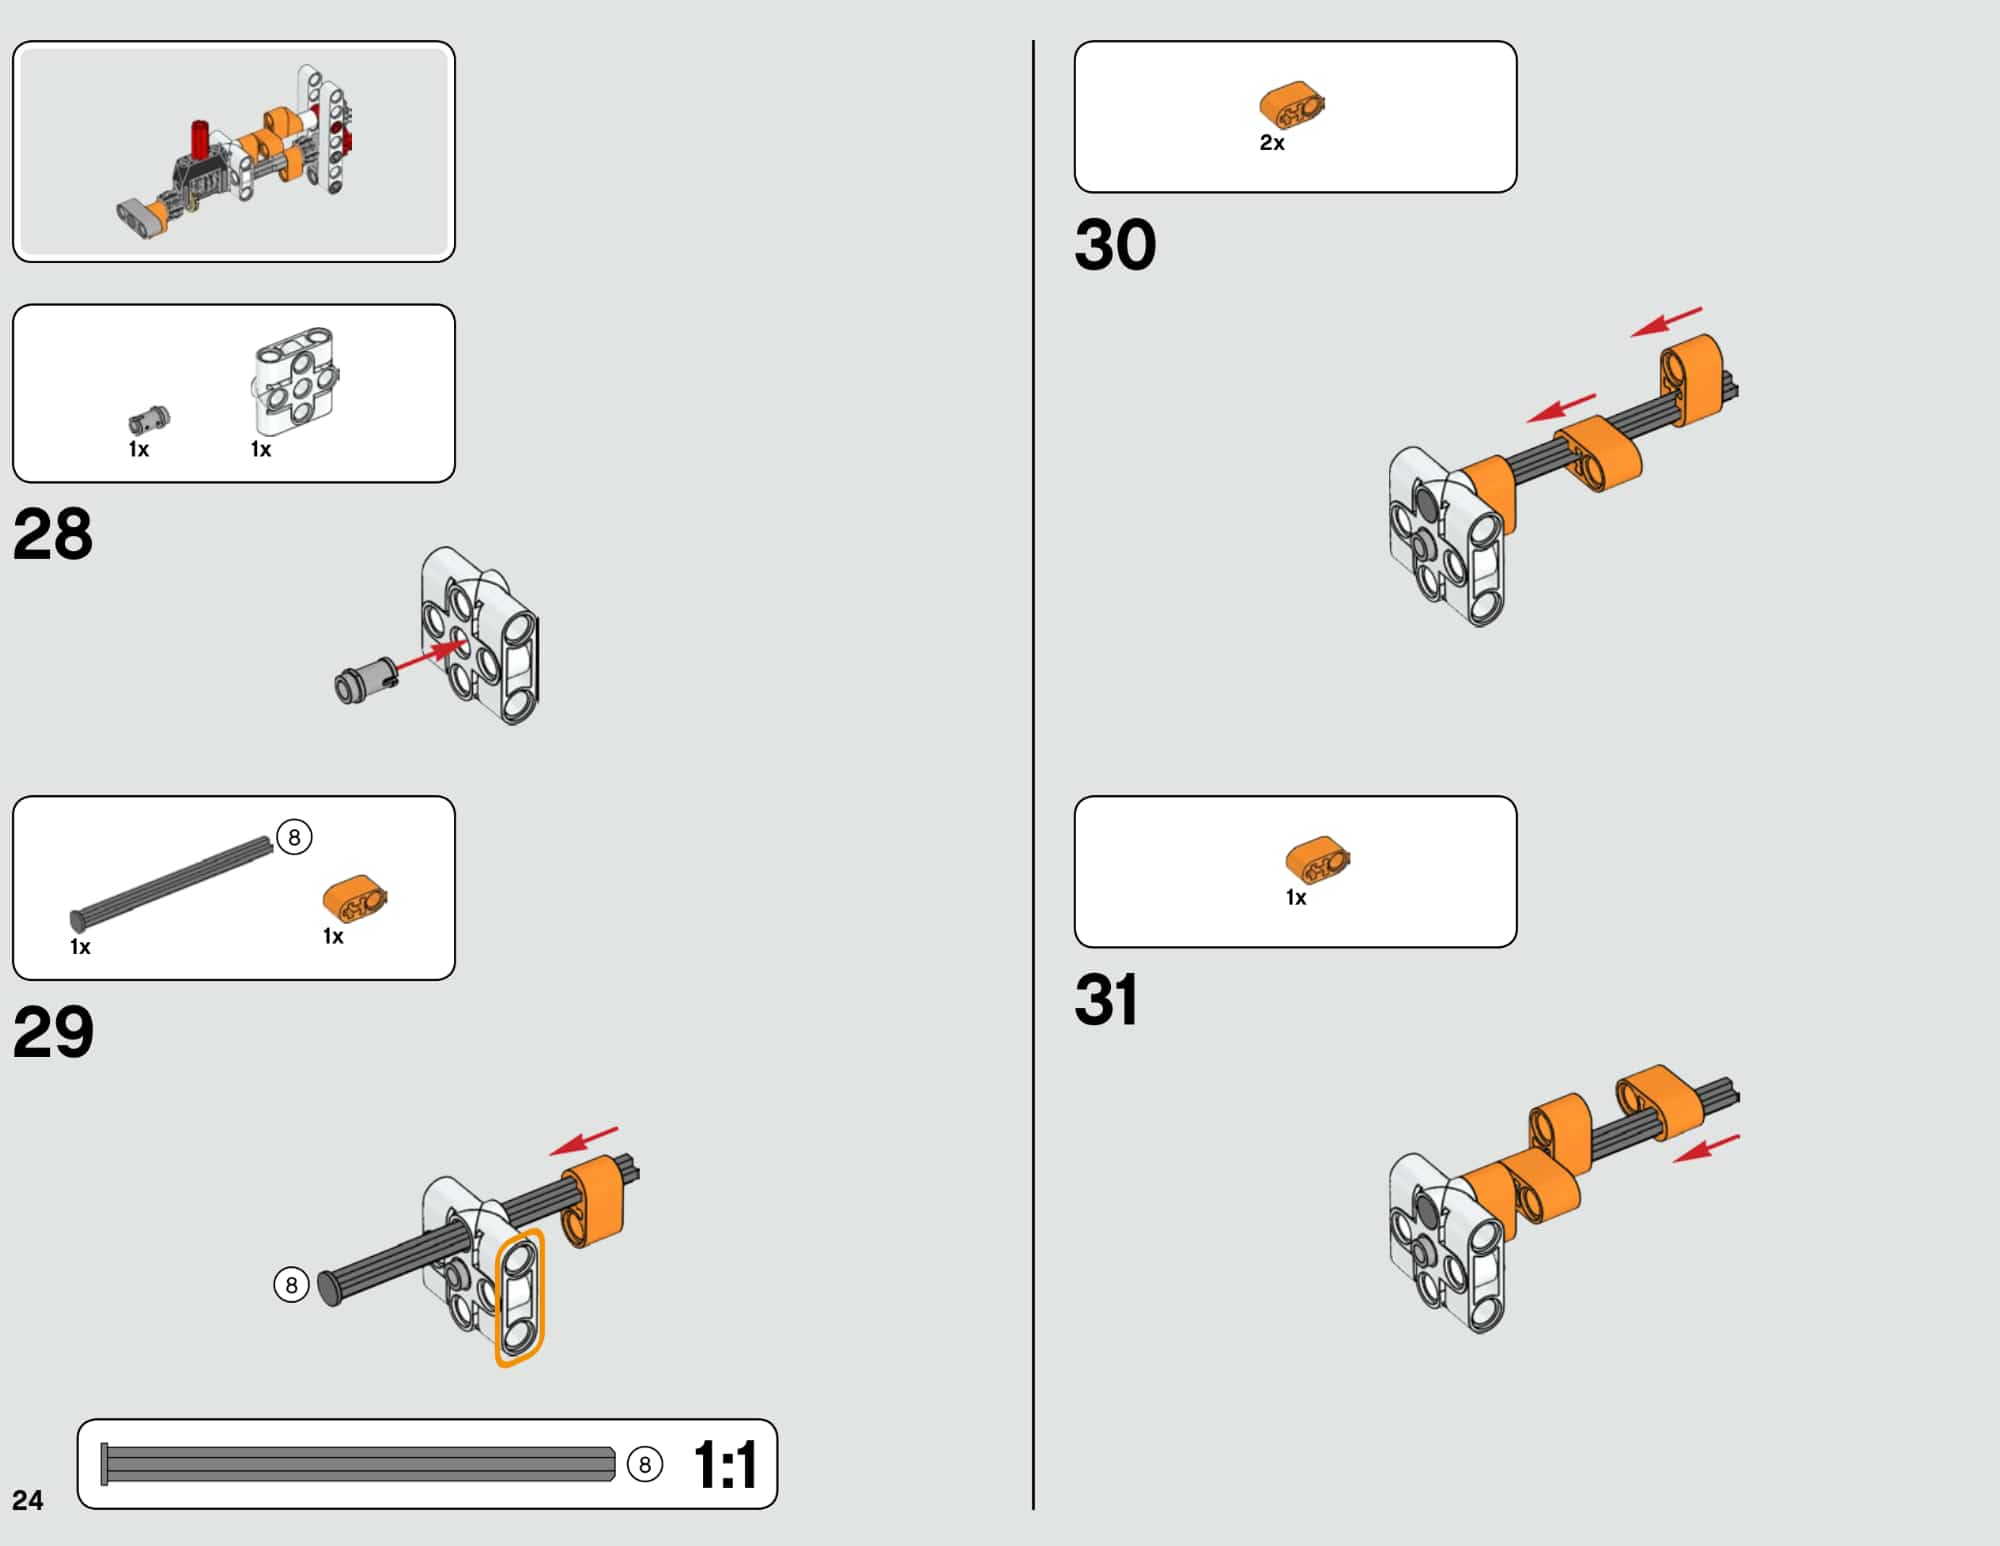 LEGO 42112 Betonmischer Lkw - Anleitung Seite 24 neu